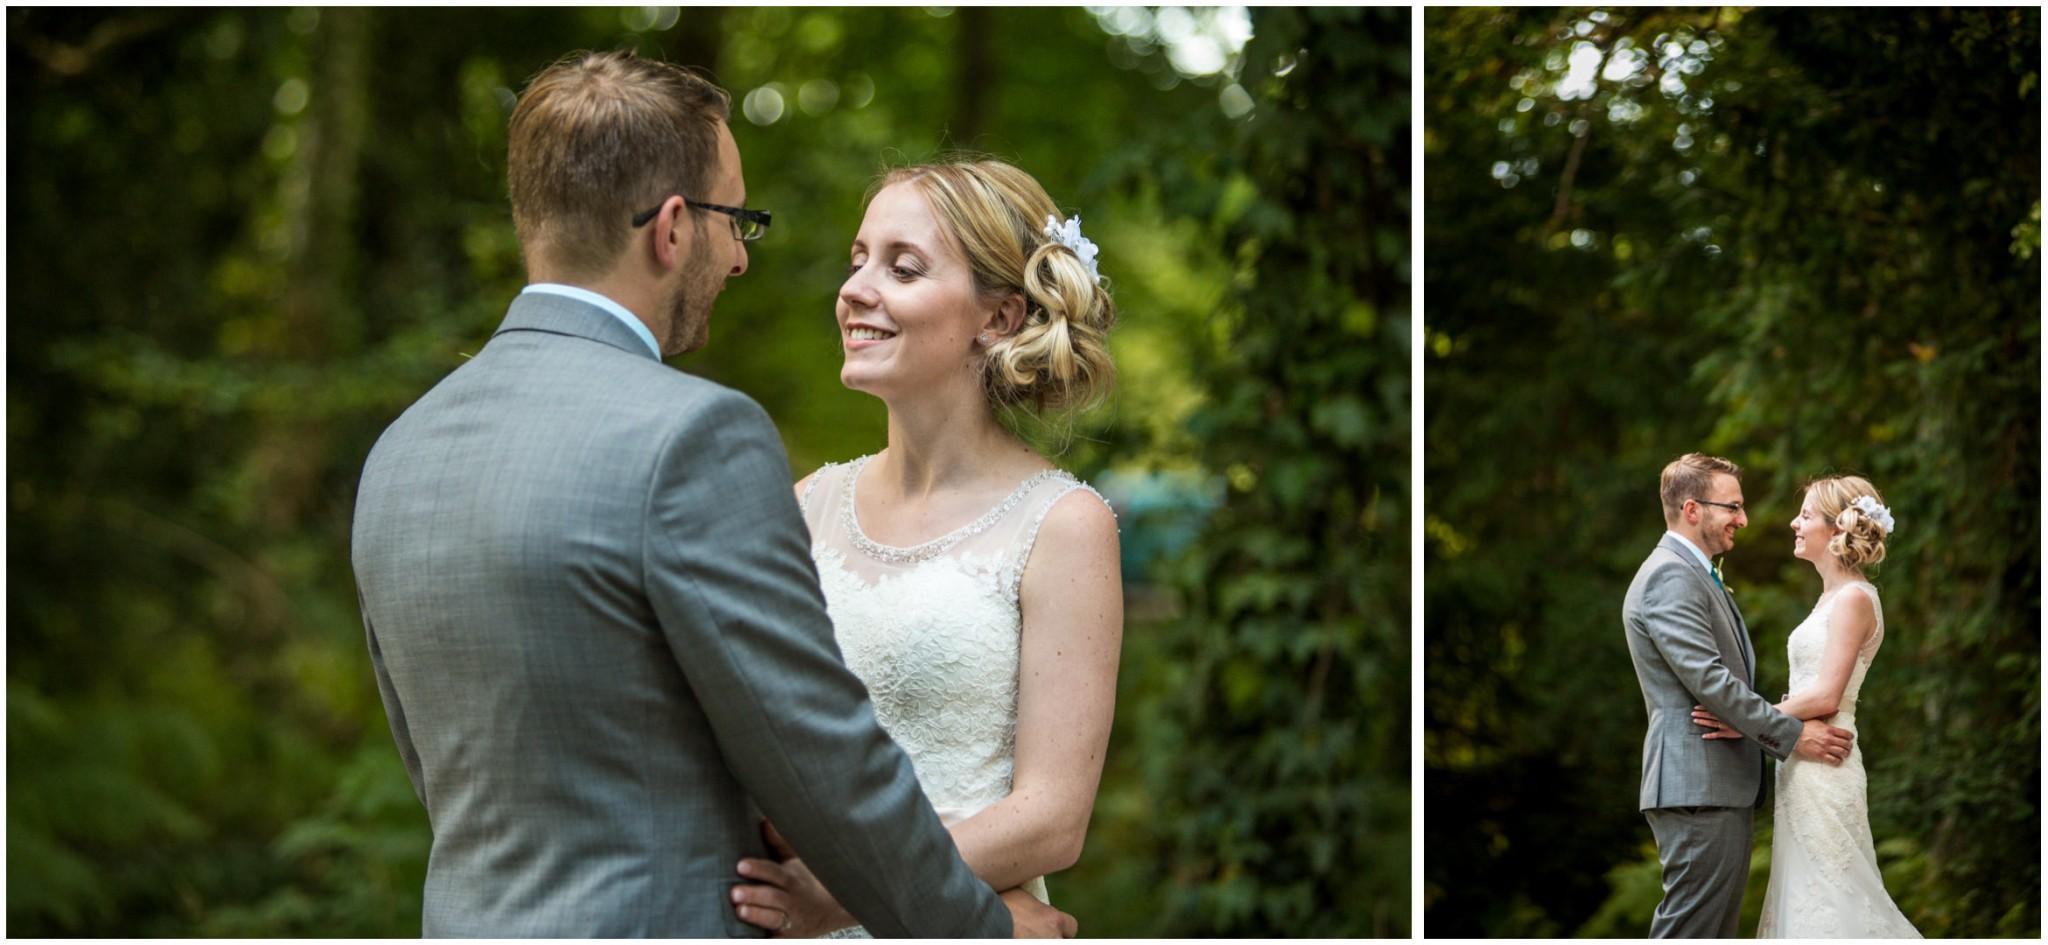 Tournerbury Woods Estate Wedding Bride & Groom Portrait in Woods